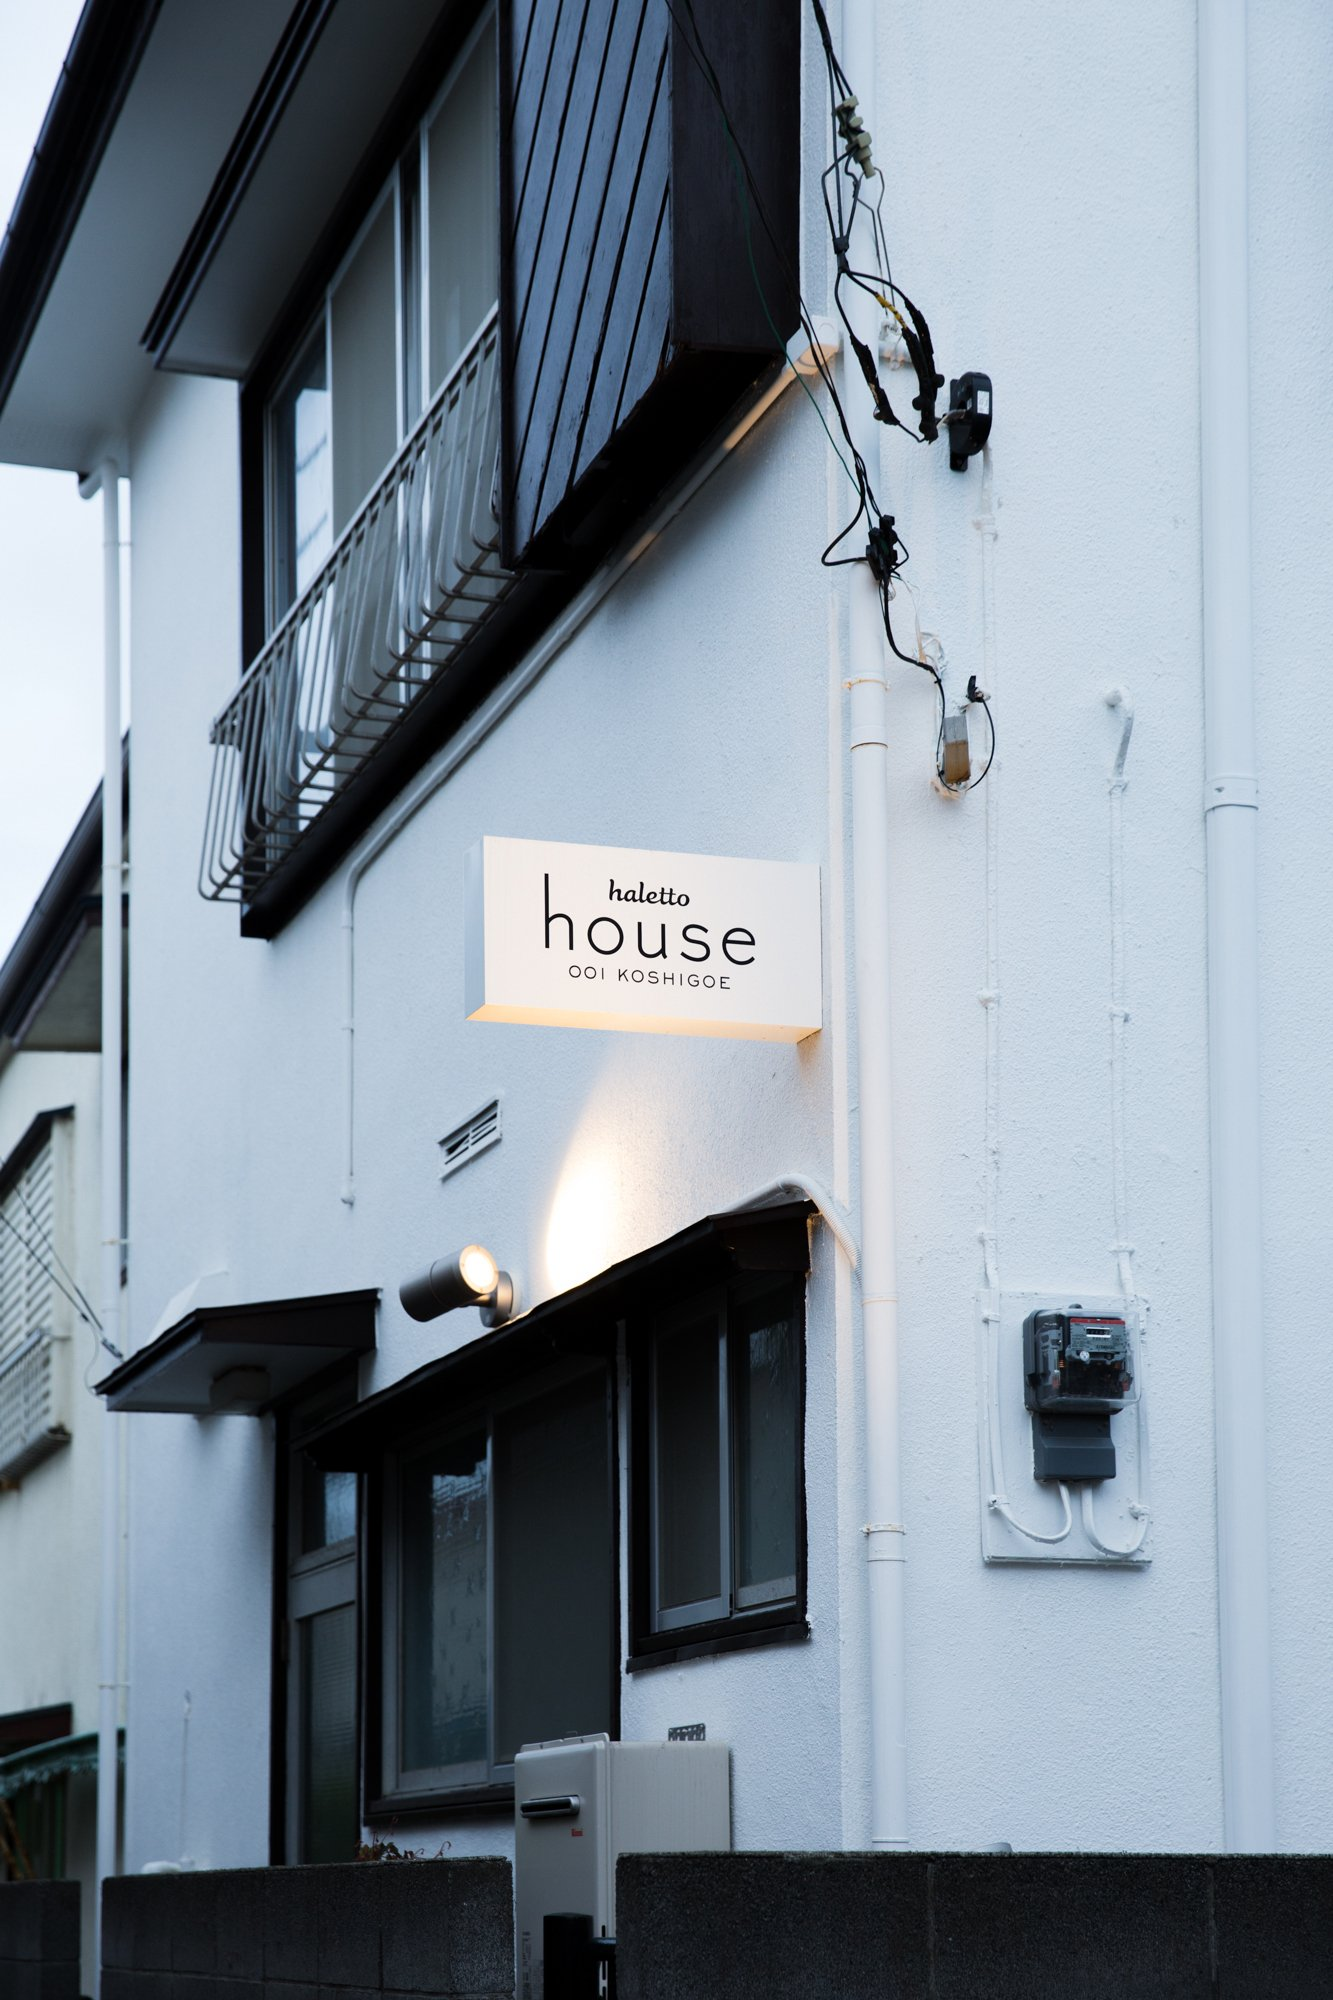 haletto house KOSHIGOEの看板